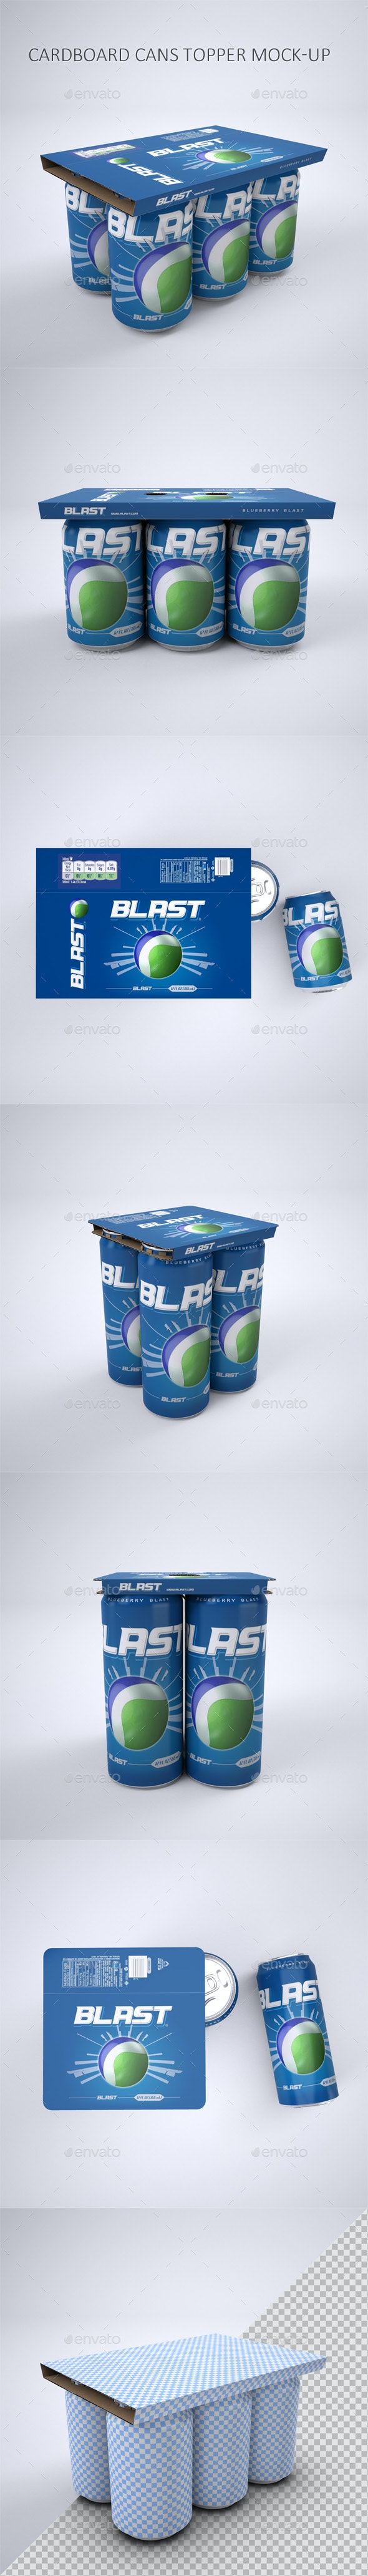 Cardboard Topper for Beverage Cans Mock-Up - Food and Drink Packaging